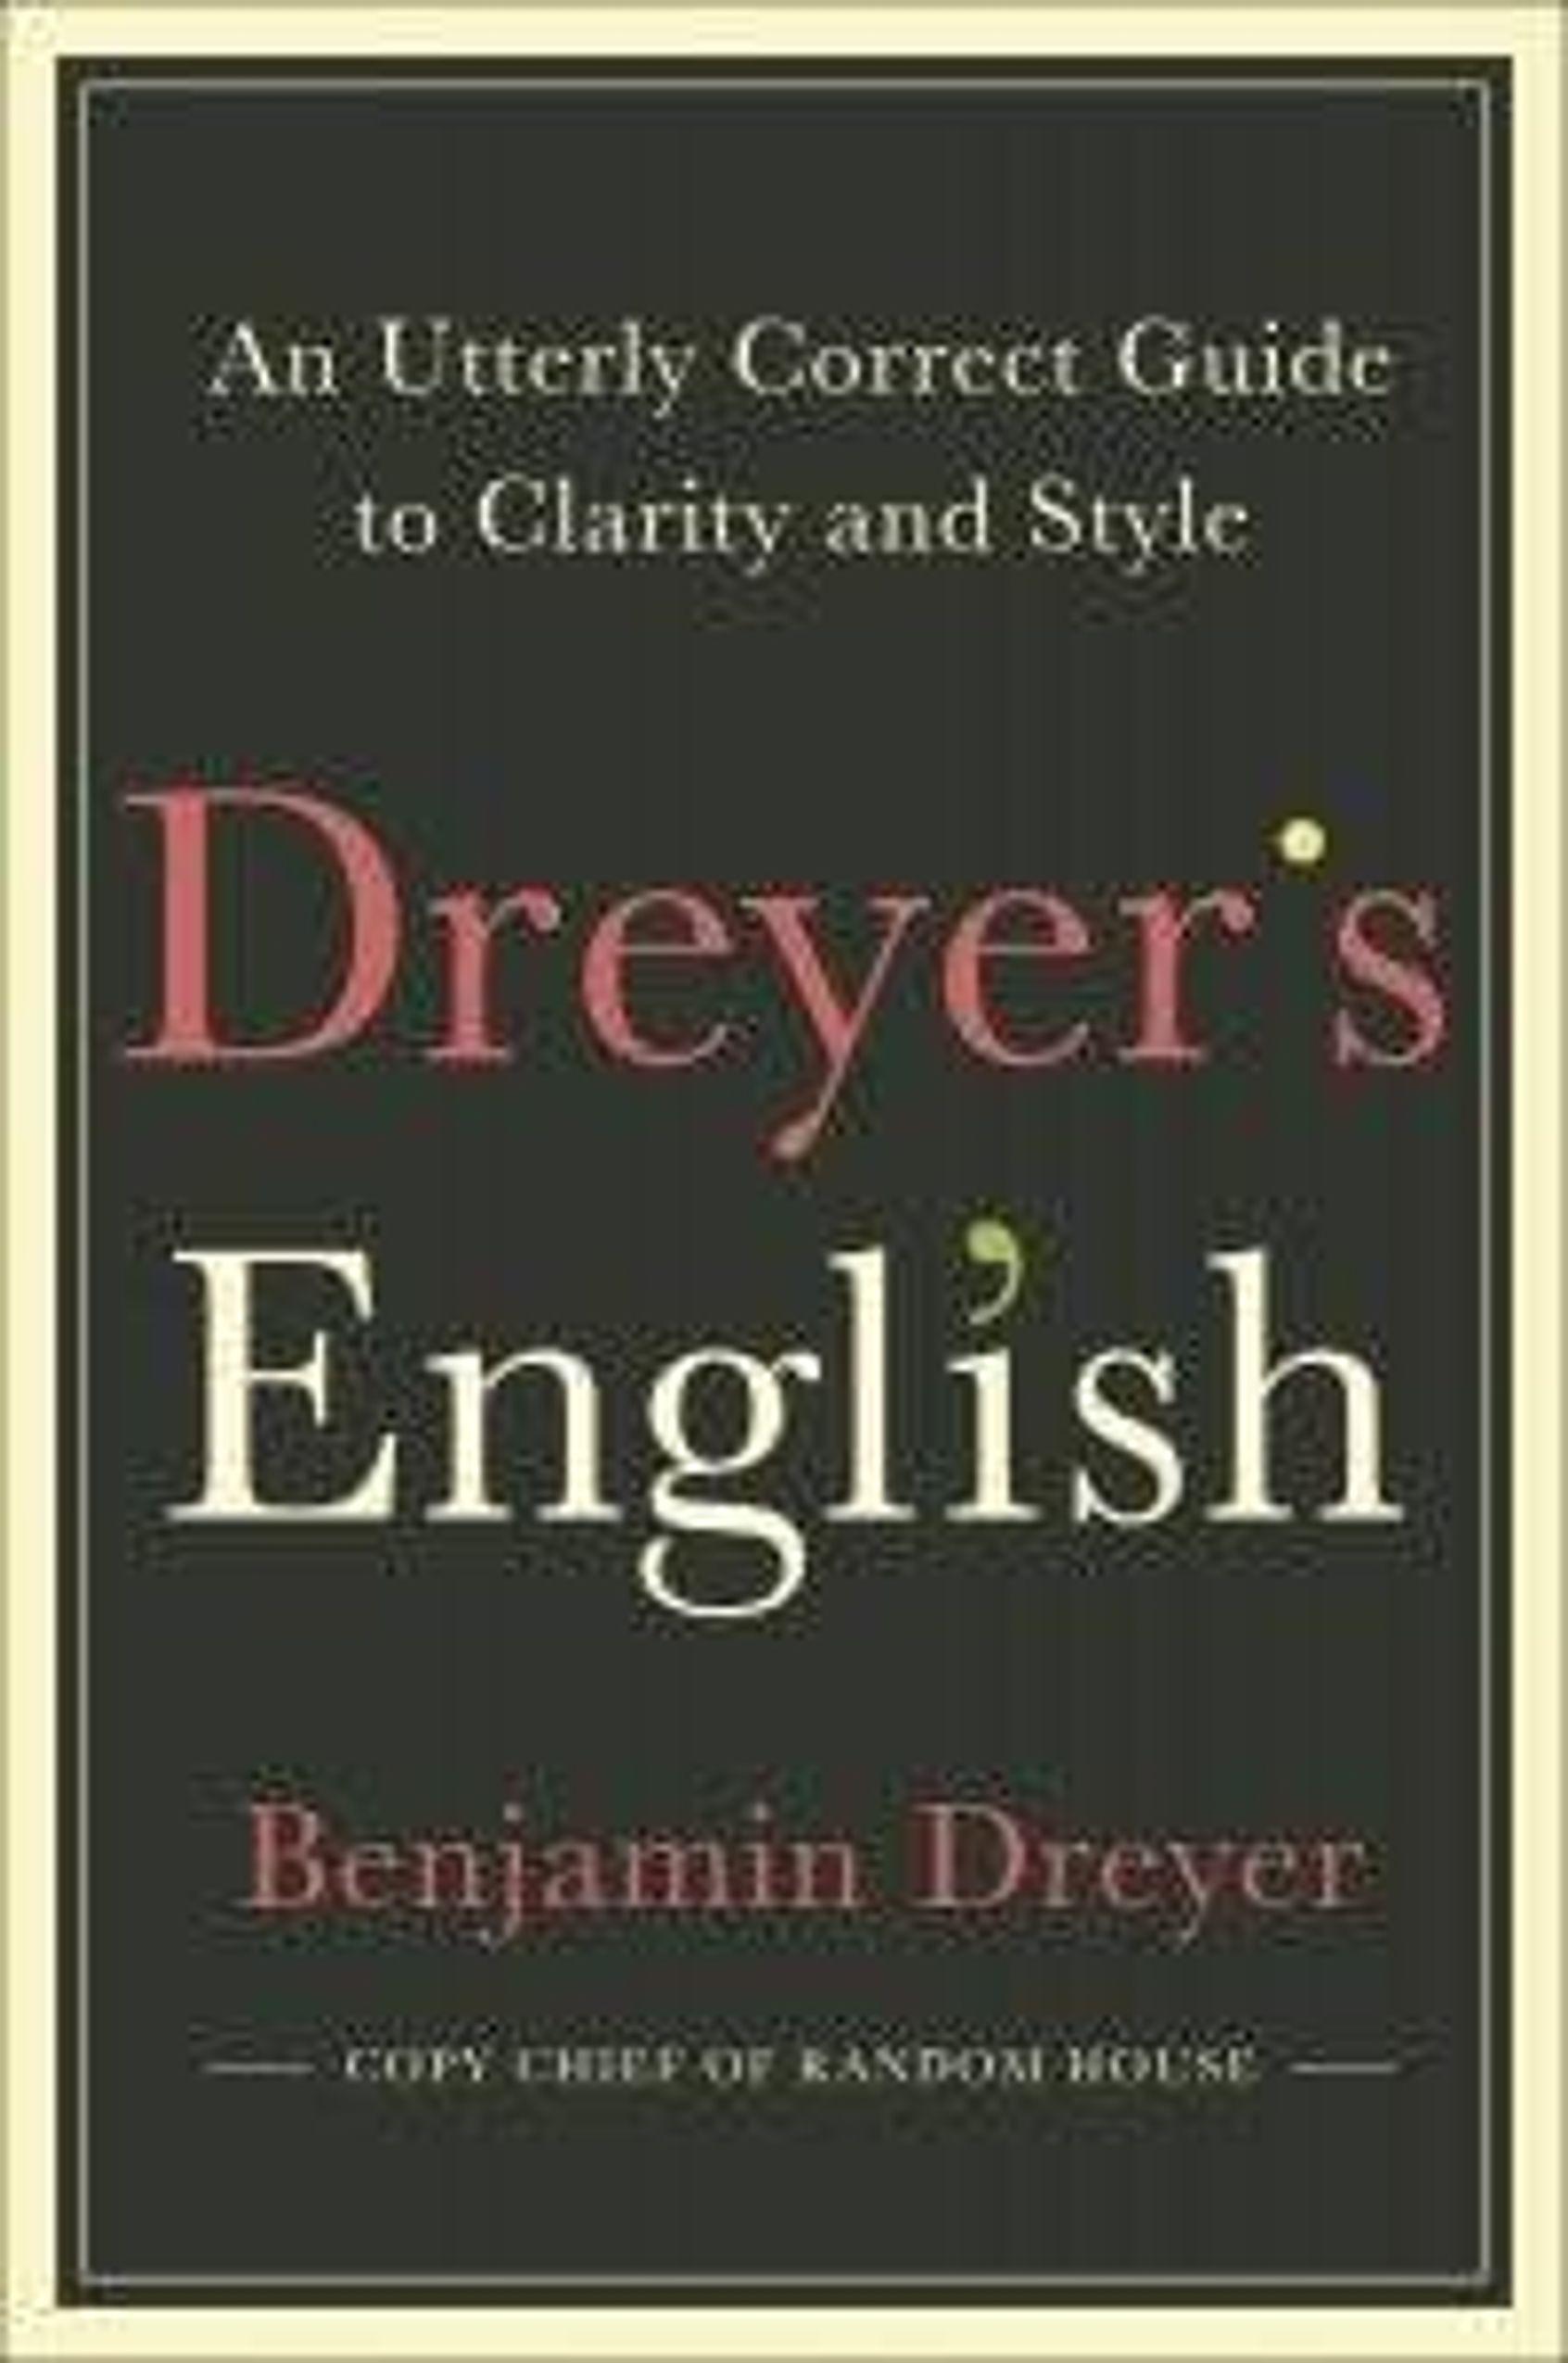 Dreyer's English cover